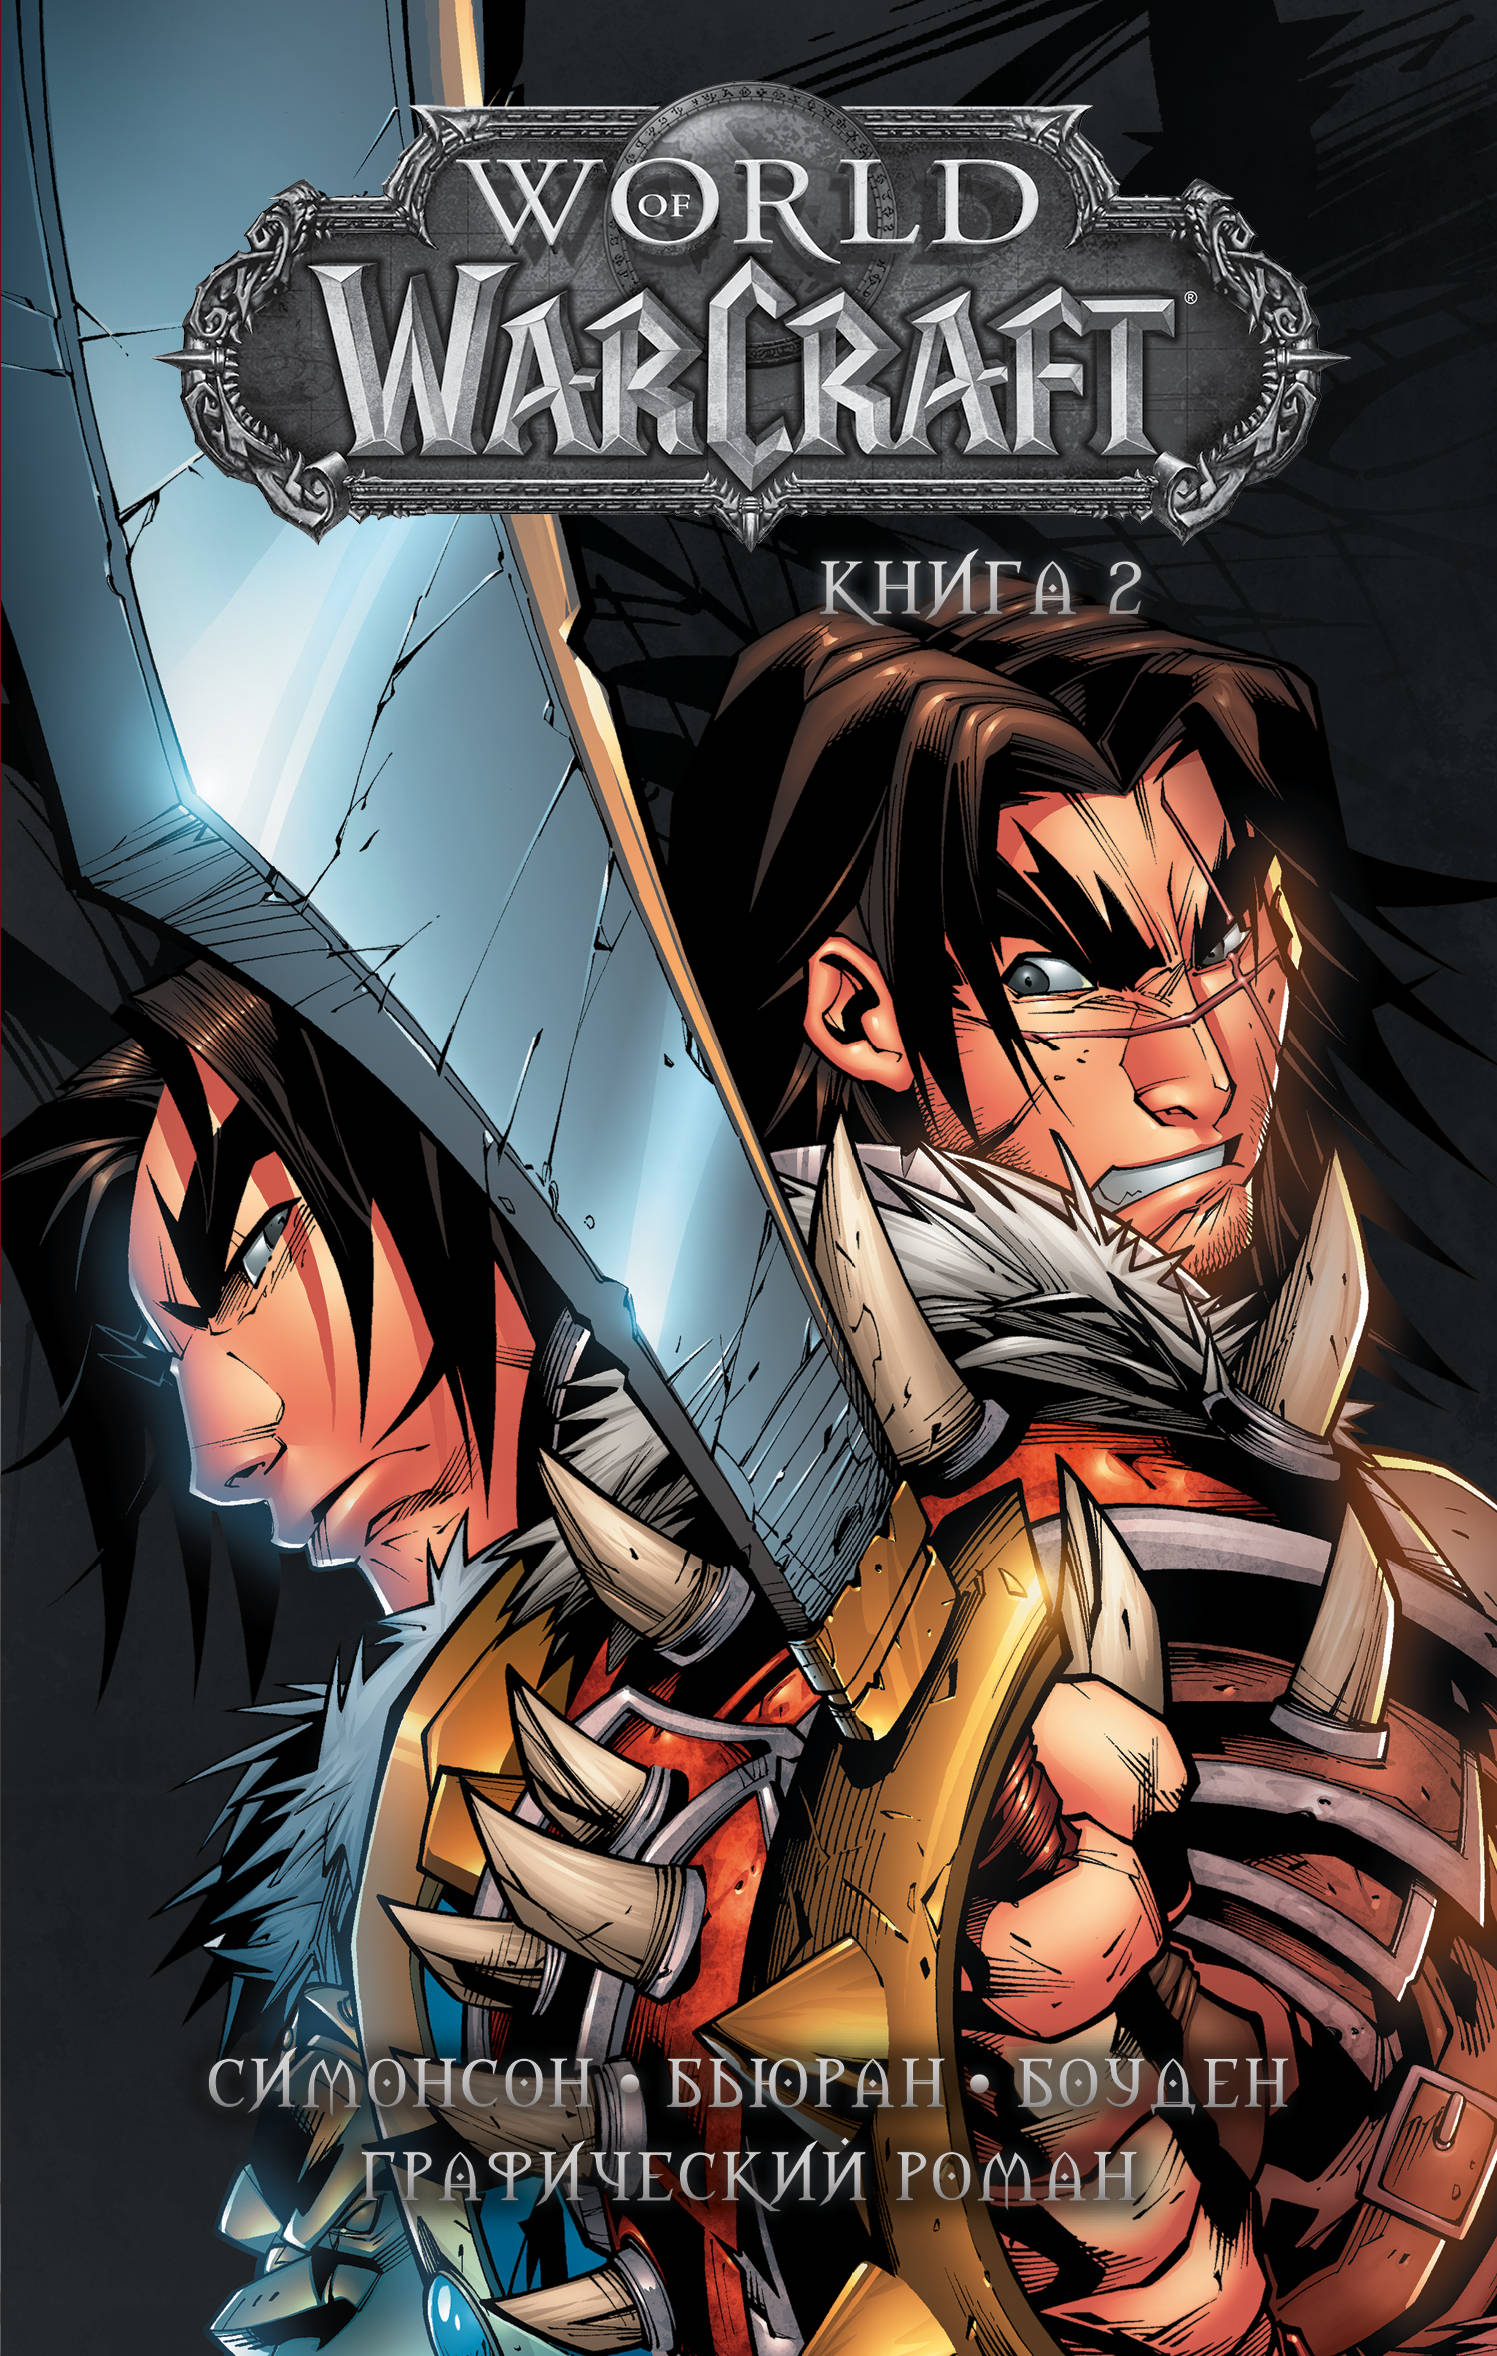 World of Warcraft: Kniga 2